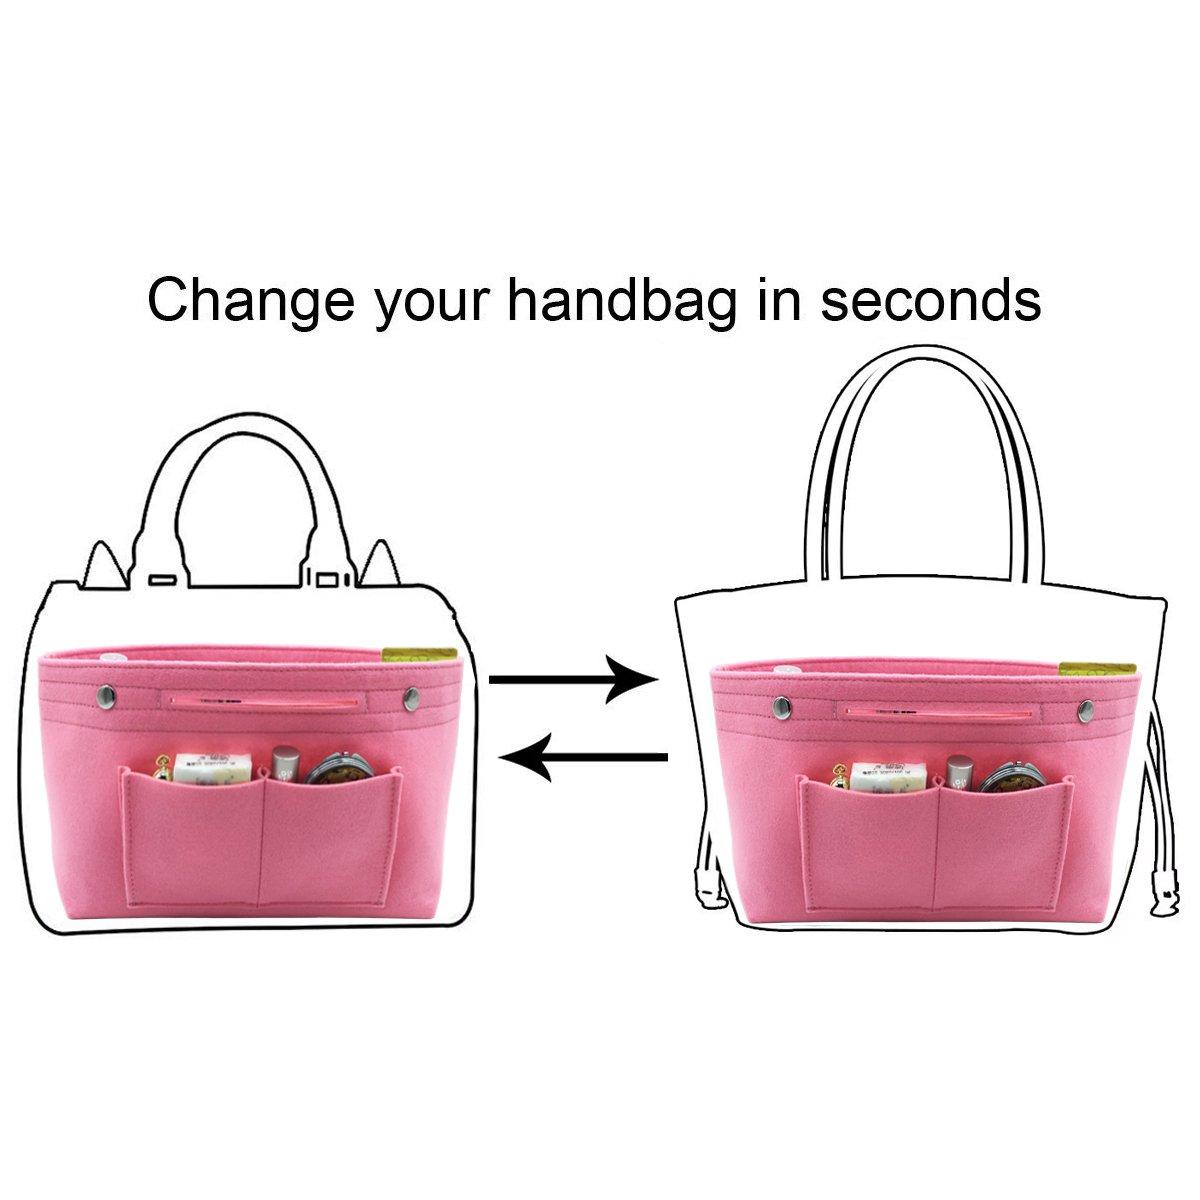 HyFanStr Womens Purse Organizer Handbag Tote Insert Bag Tidy Travel Storage Bag Large